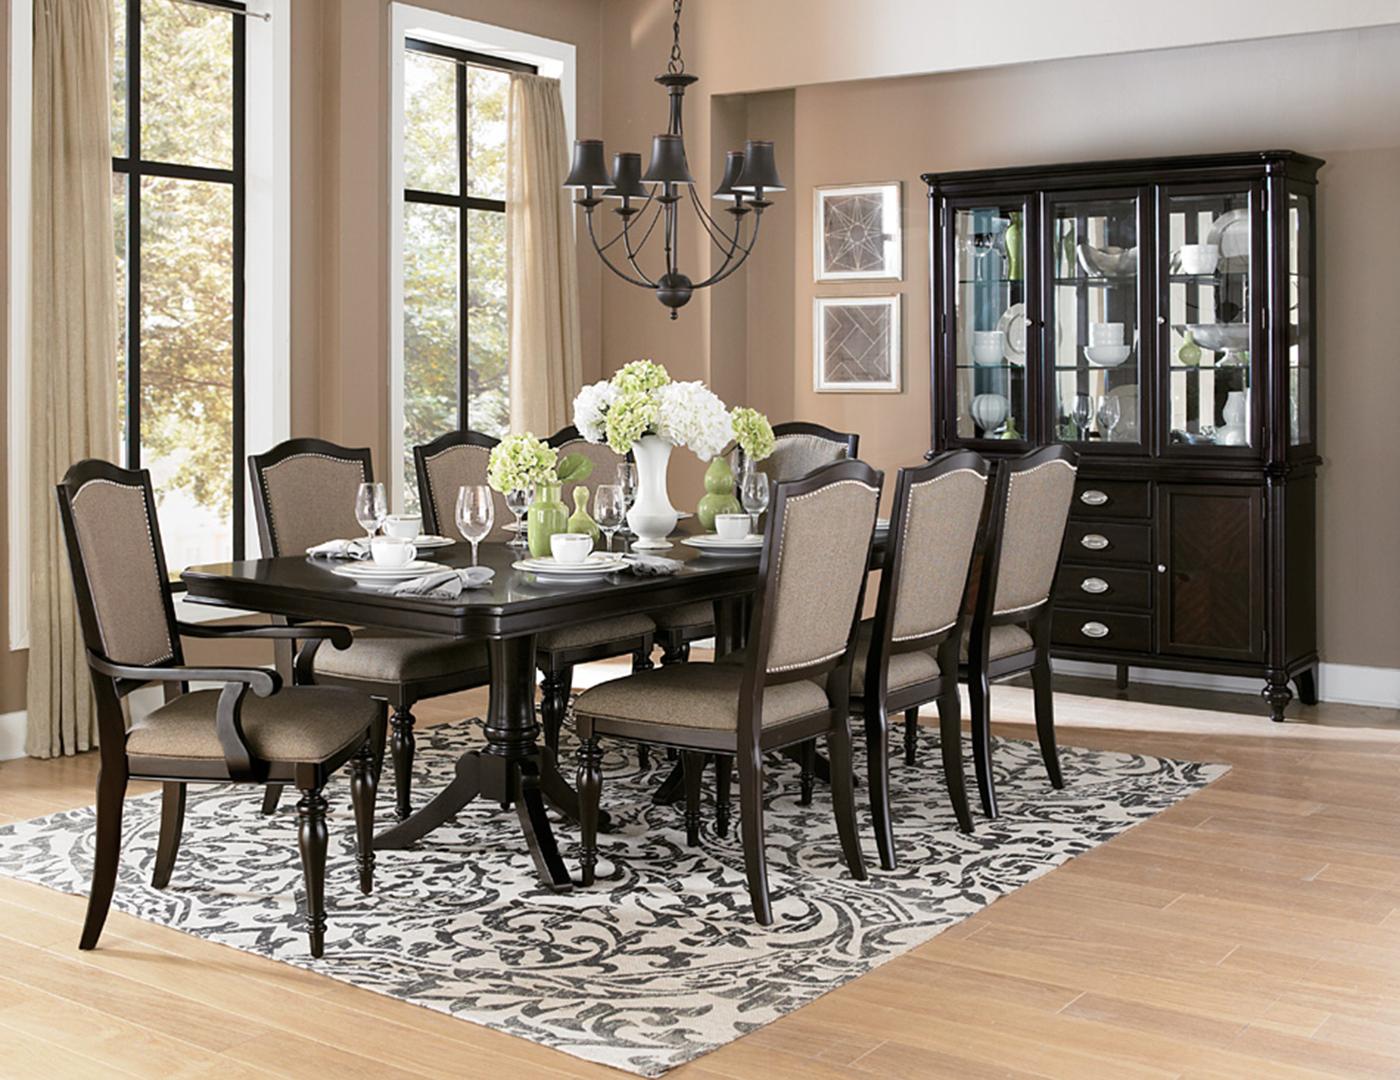 100 Bradford Dining Room Furniture Dining Tables Safavieh Home Dining Room Furniture 7